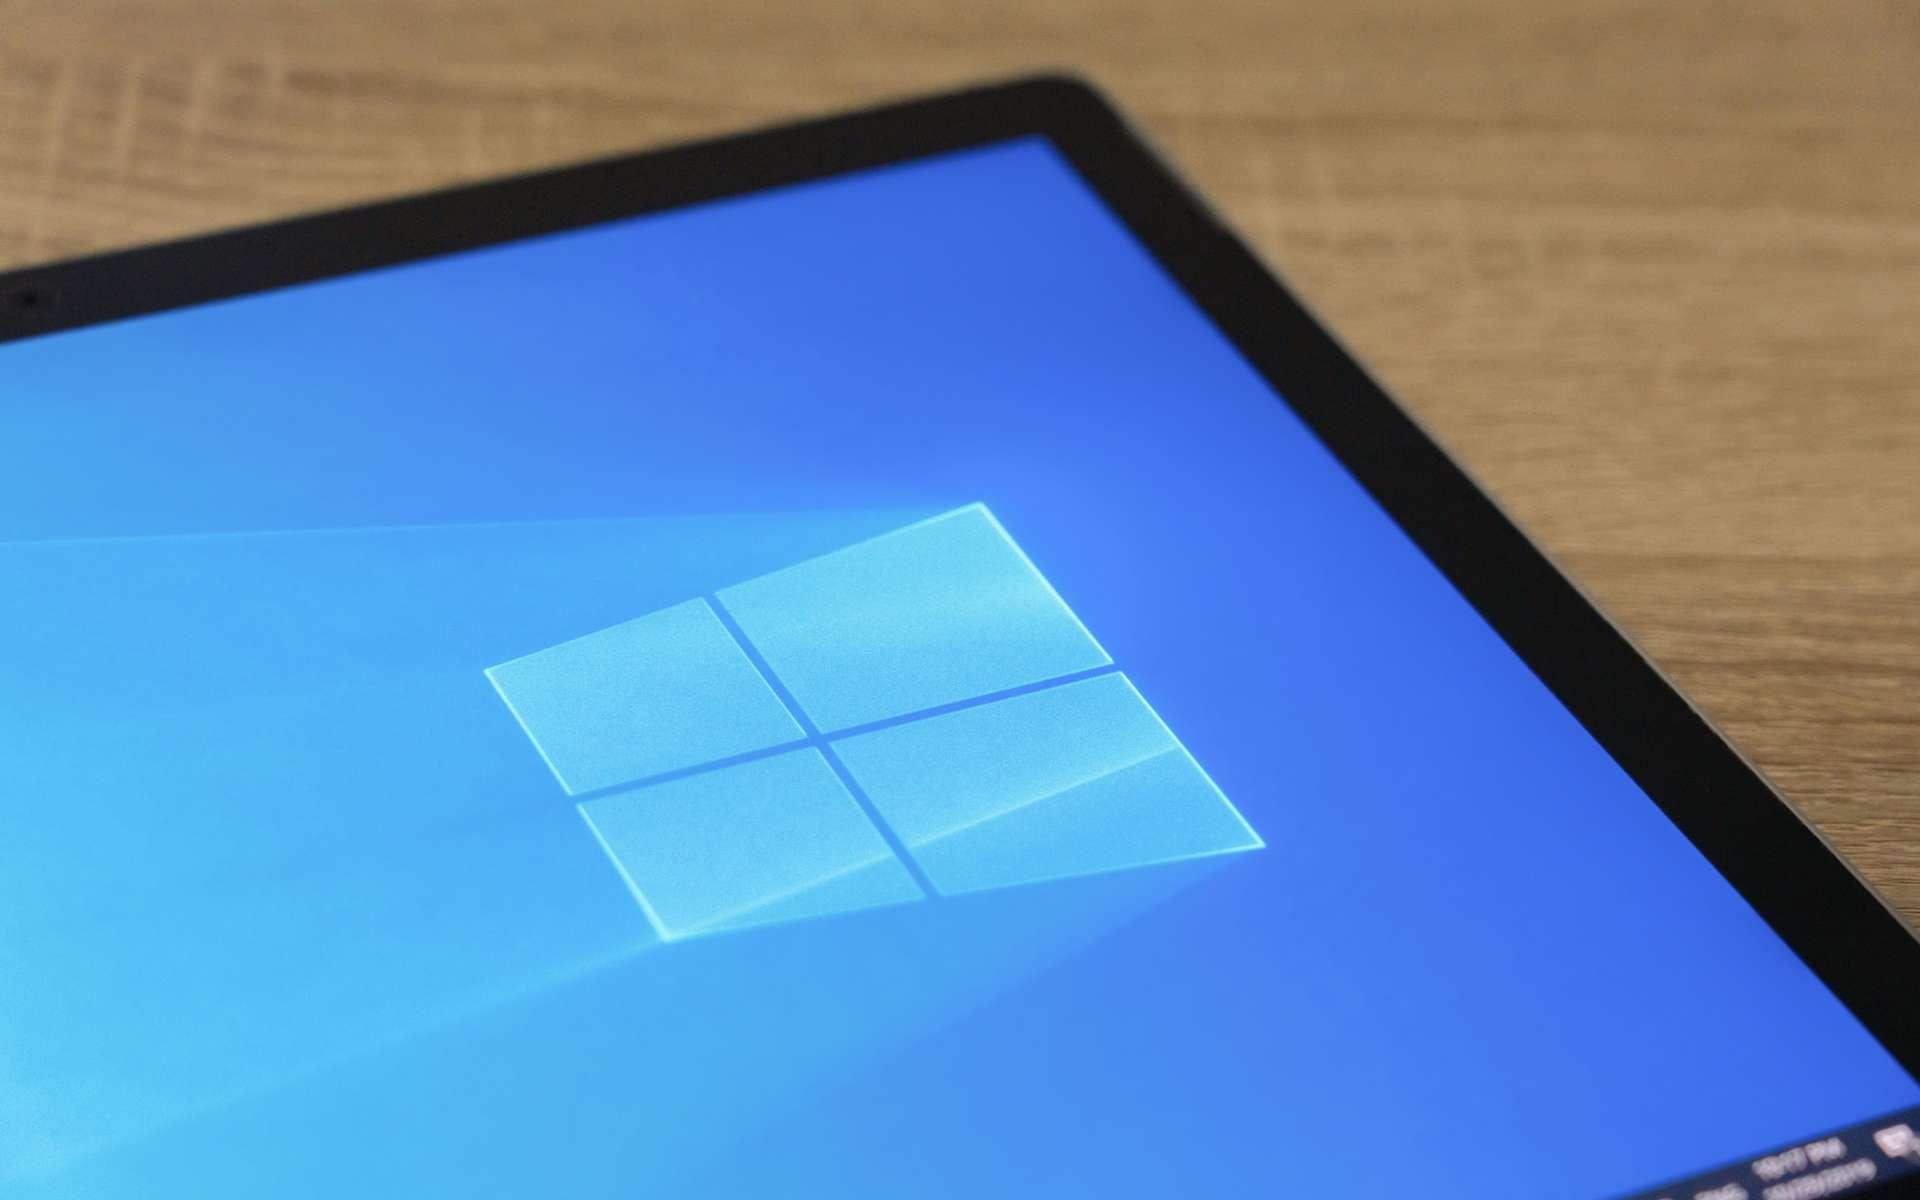 L'avenir de Windows 10 sera la simplicité et le minimalisme. © Charnsitr, Adobe Stock